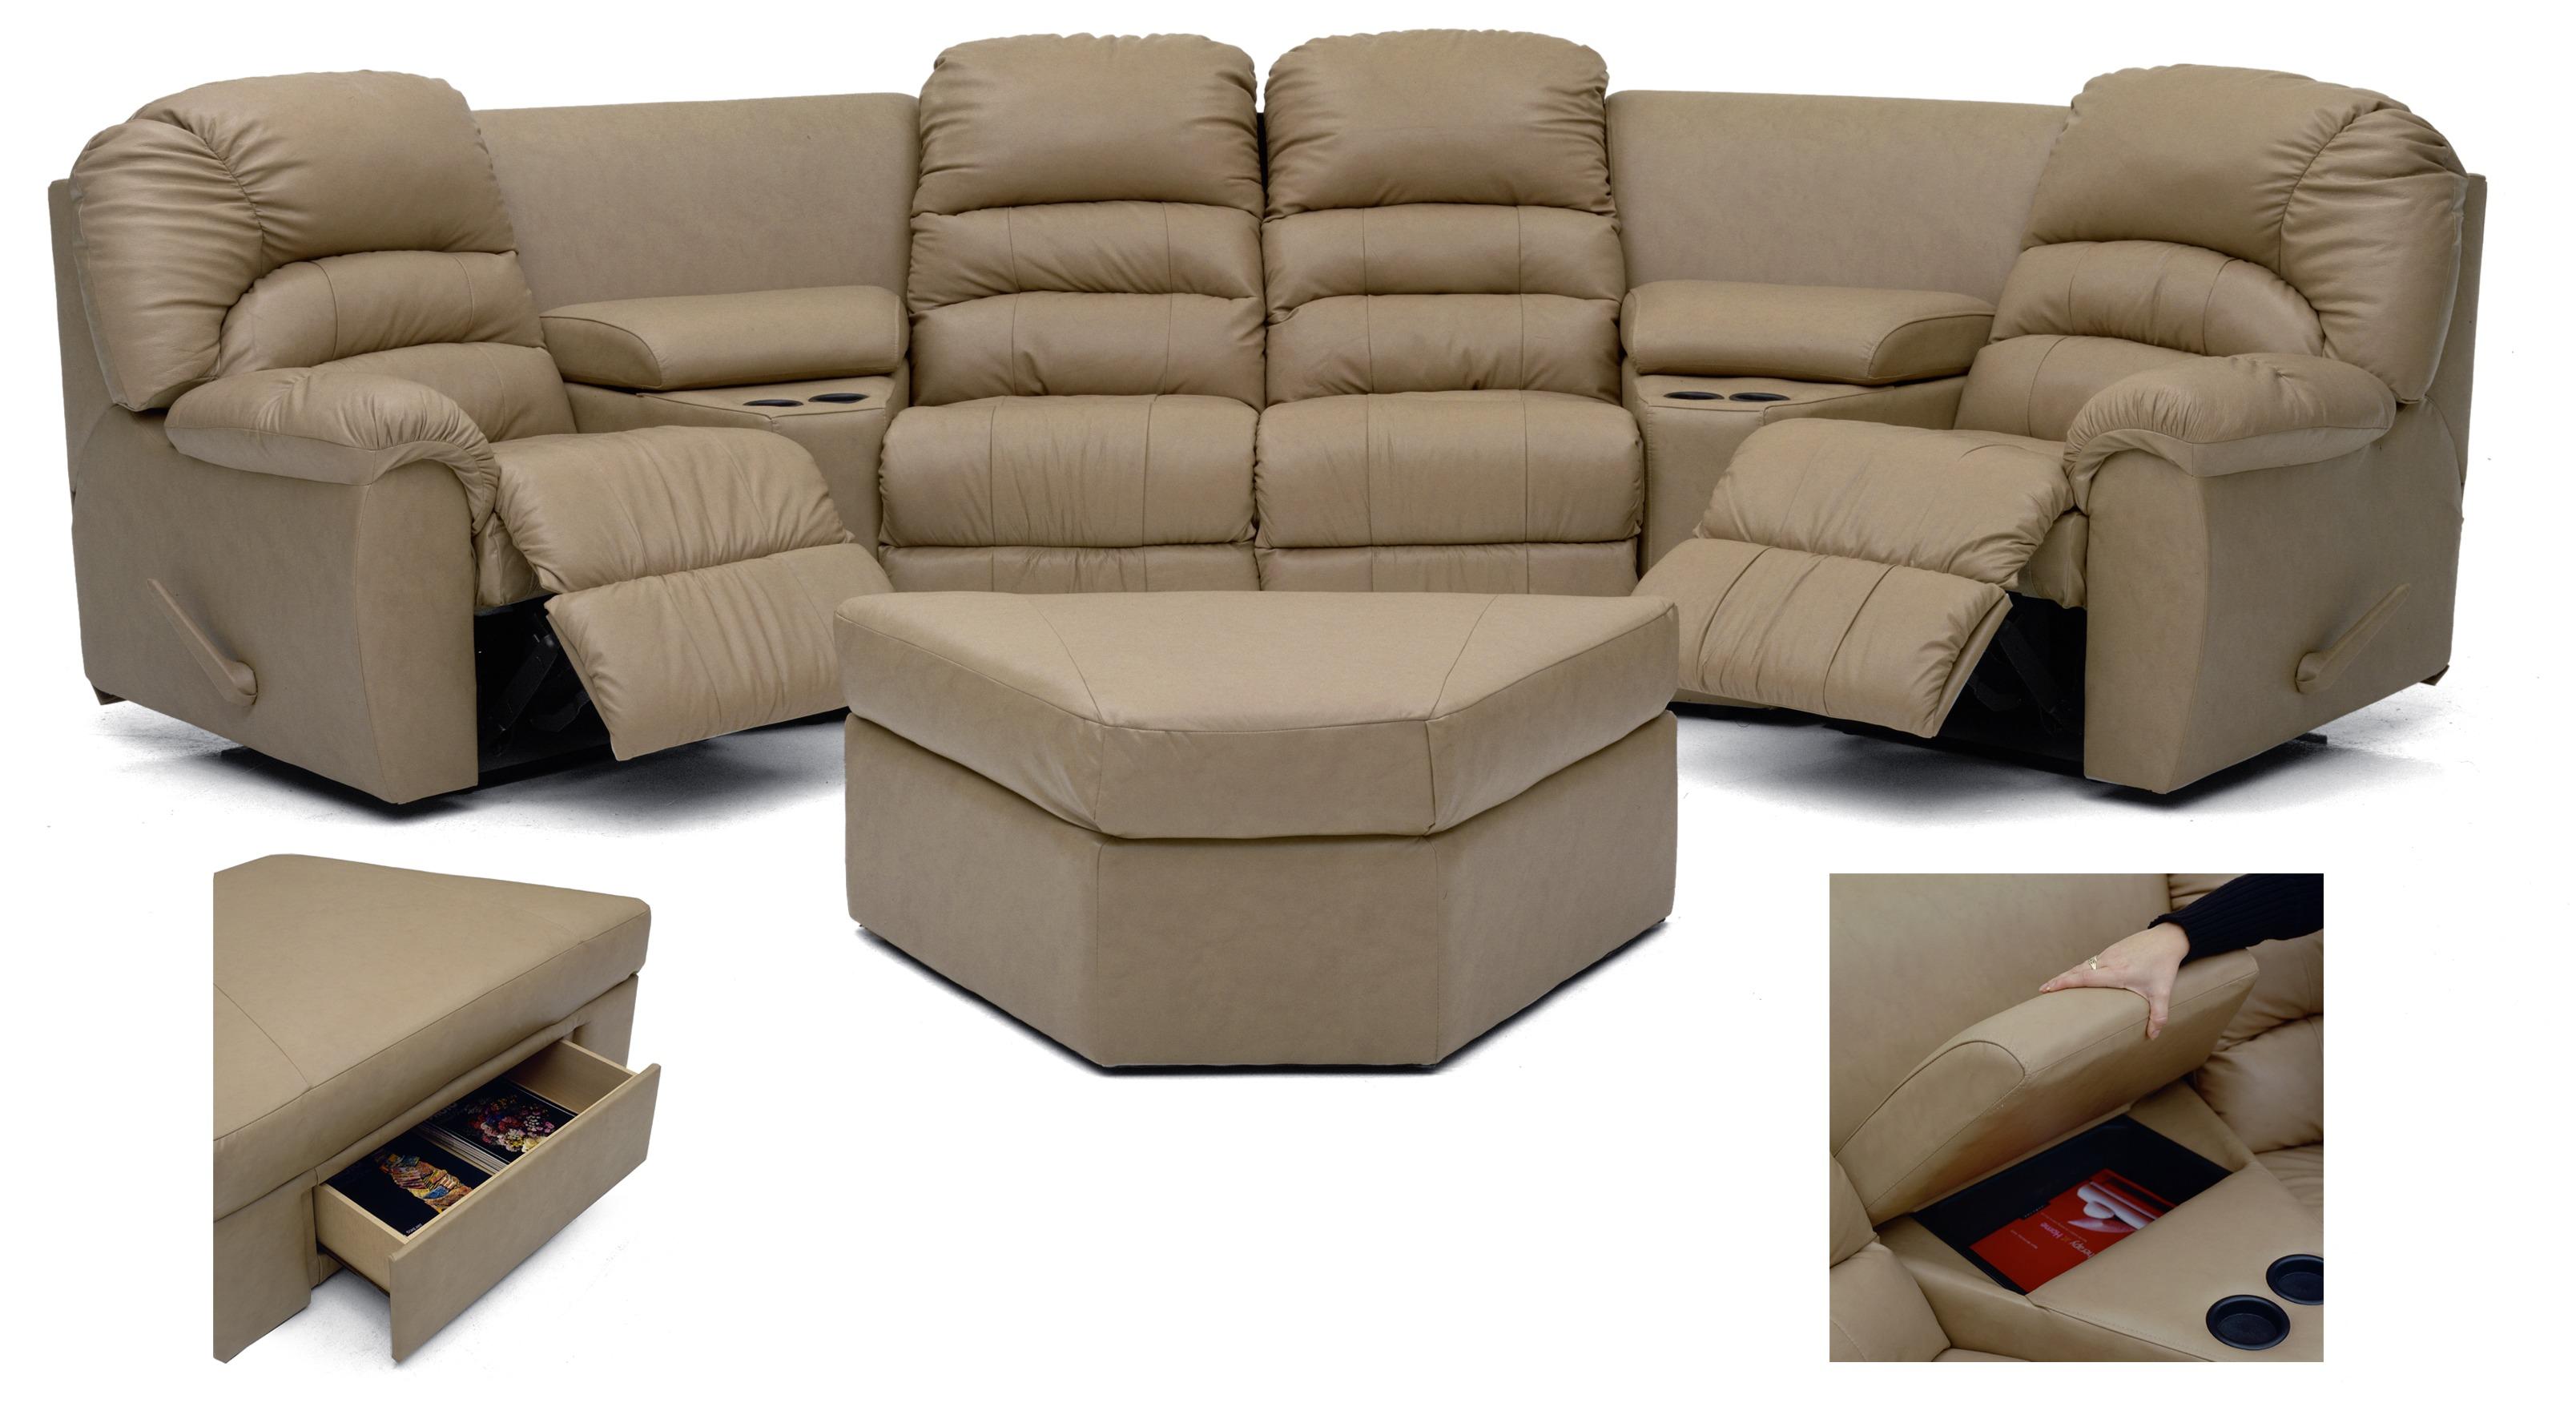 taurus 41093 46093 reclining